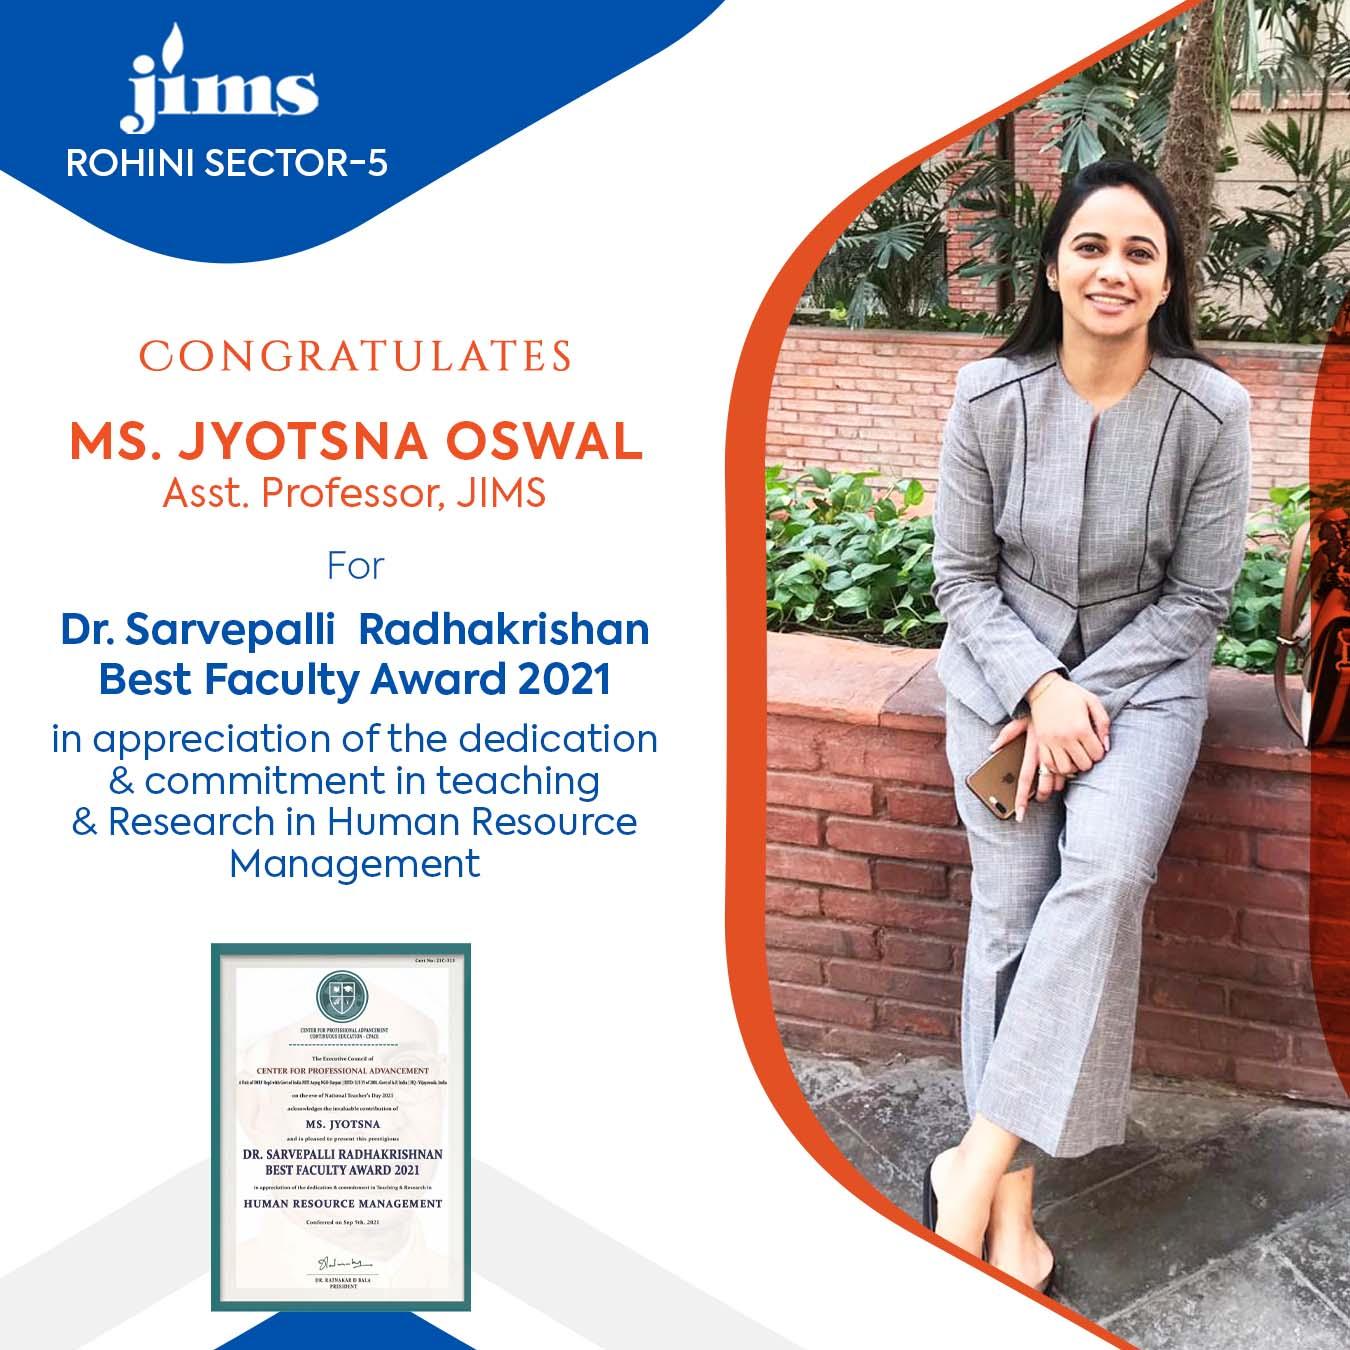 Ms. Jyotsana oswal Faculty JIMS Rohini